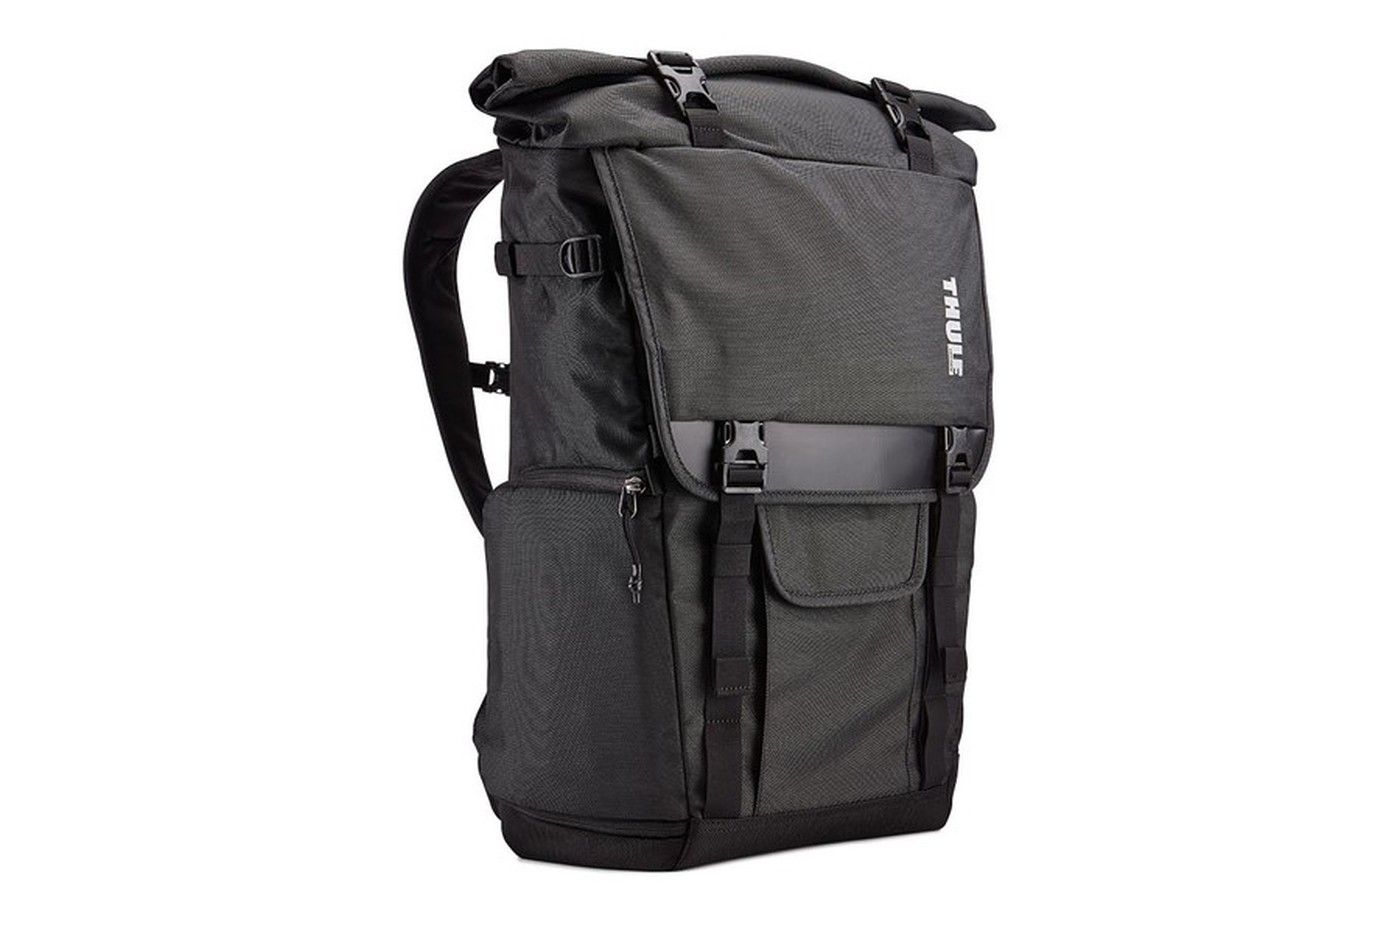 THULE Covert DSLR Rolltop Backpack - Black - Kamerataschen